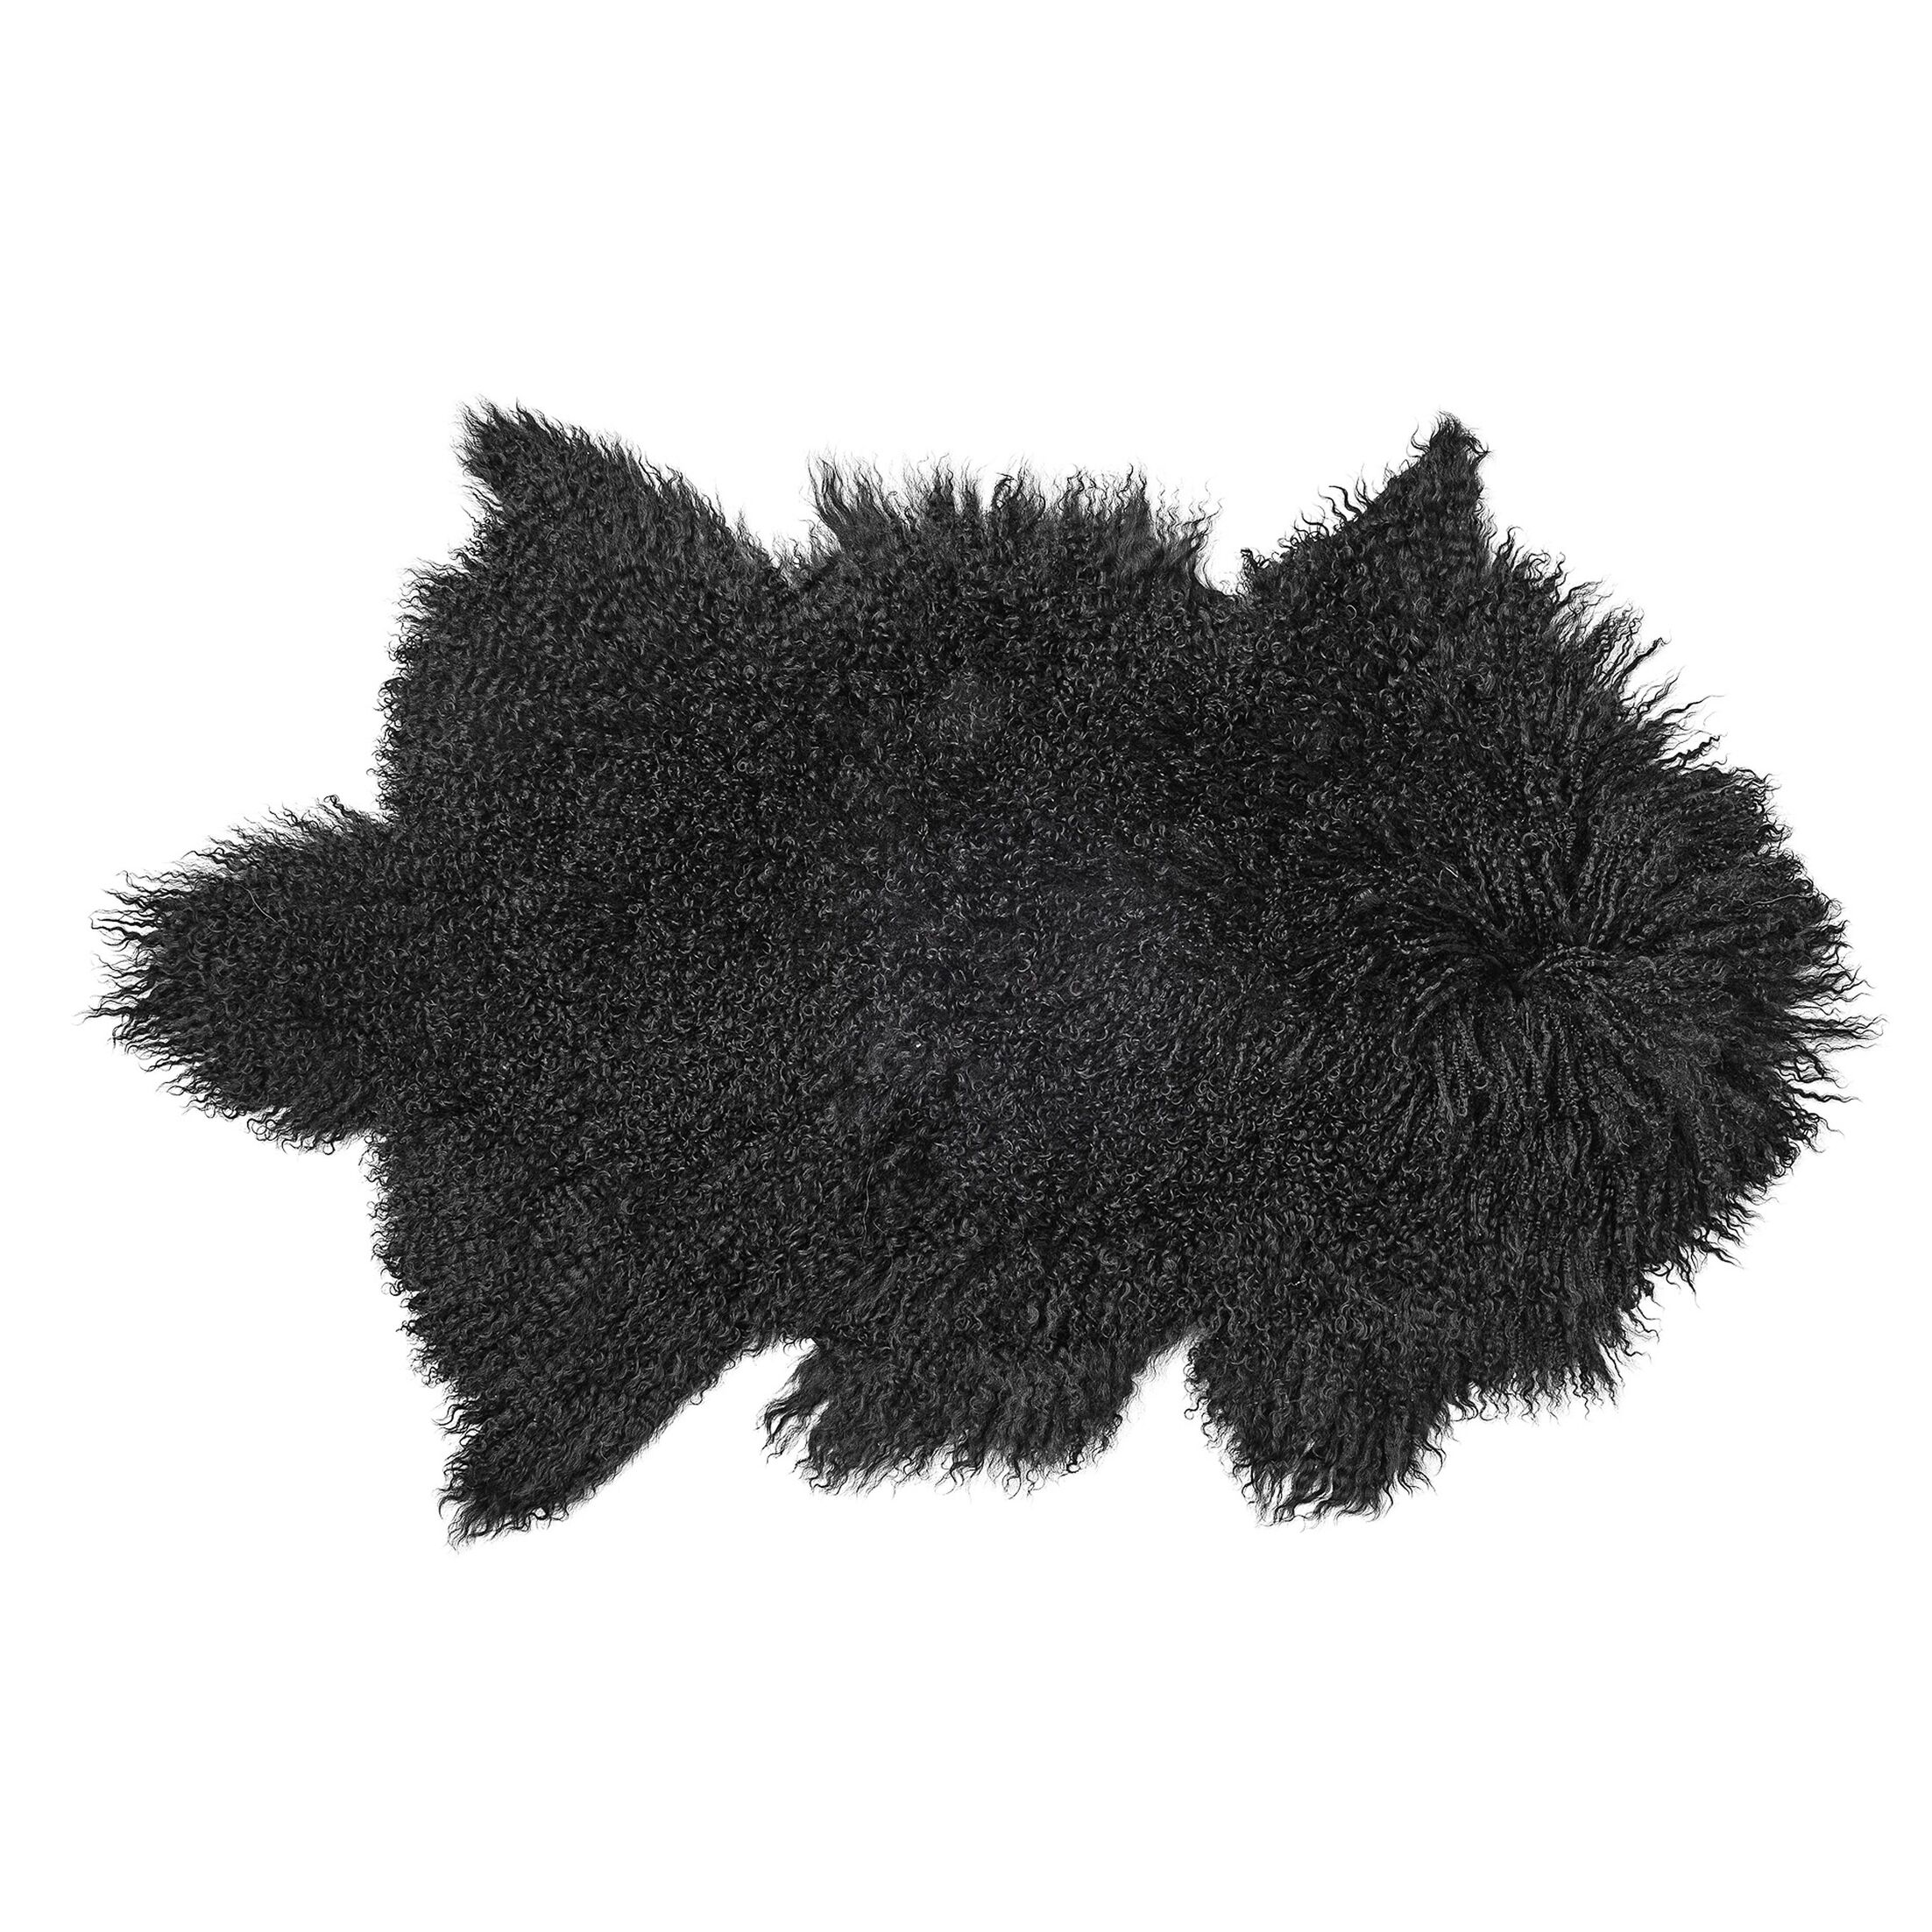 Hohl Faux Sheepskin Black Area Rug